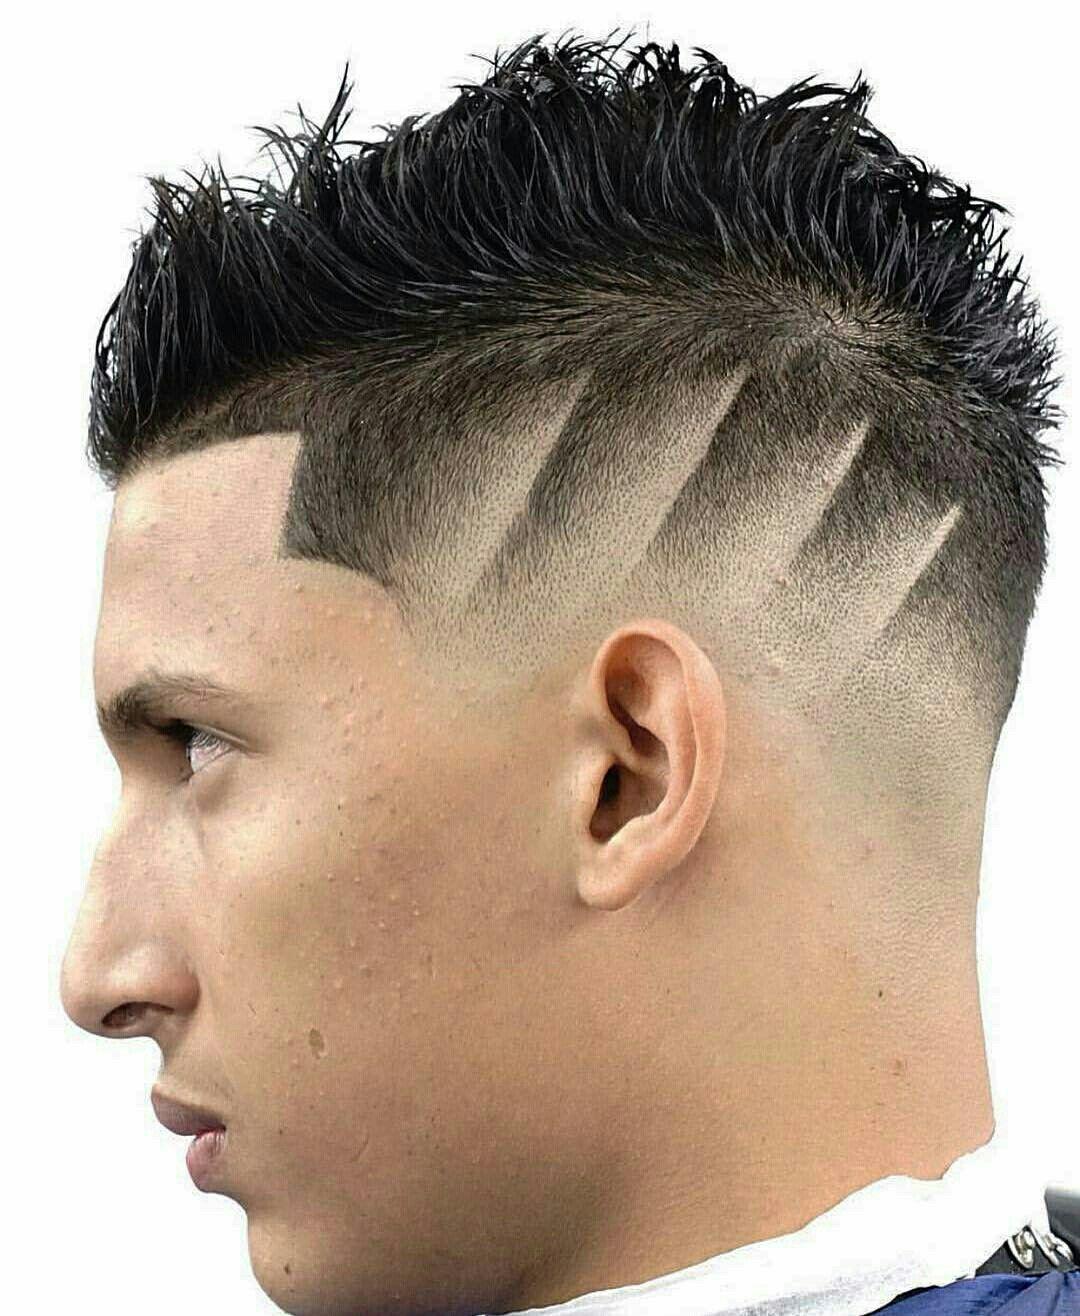 Line Design Haircut : design, haircut, Swift, Lineas, (lines), Projetos, Cabelo, Raspado,, Desenho, Masculino,, Barba